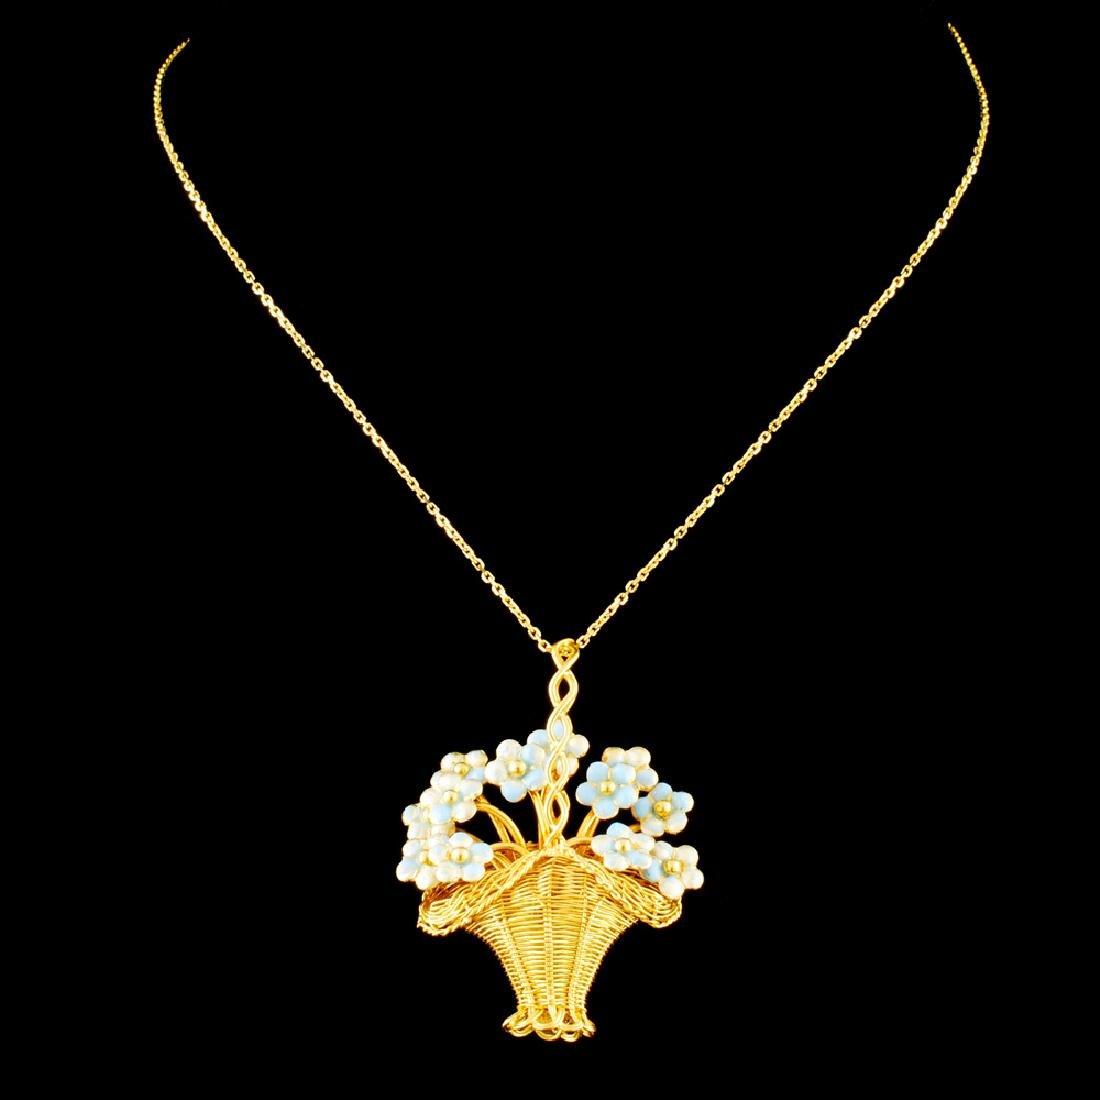 18K Gold Enamel Pendant